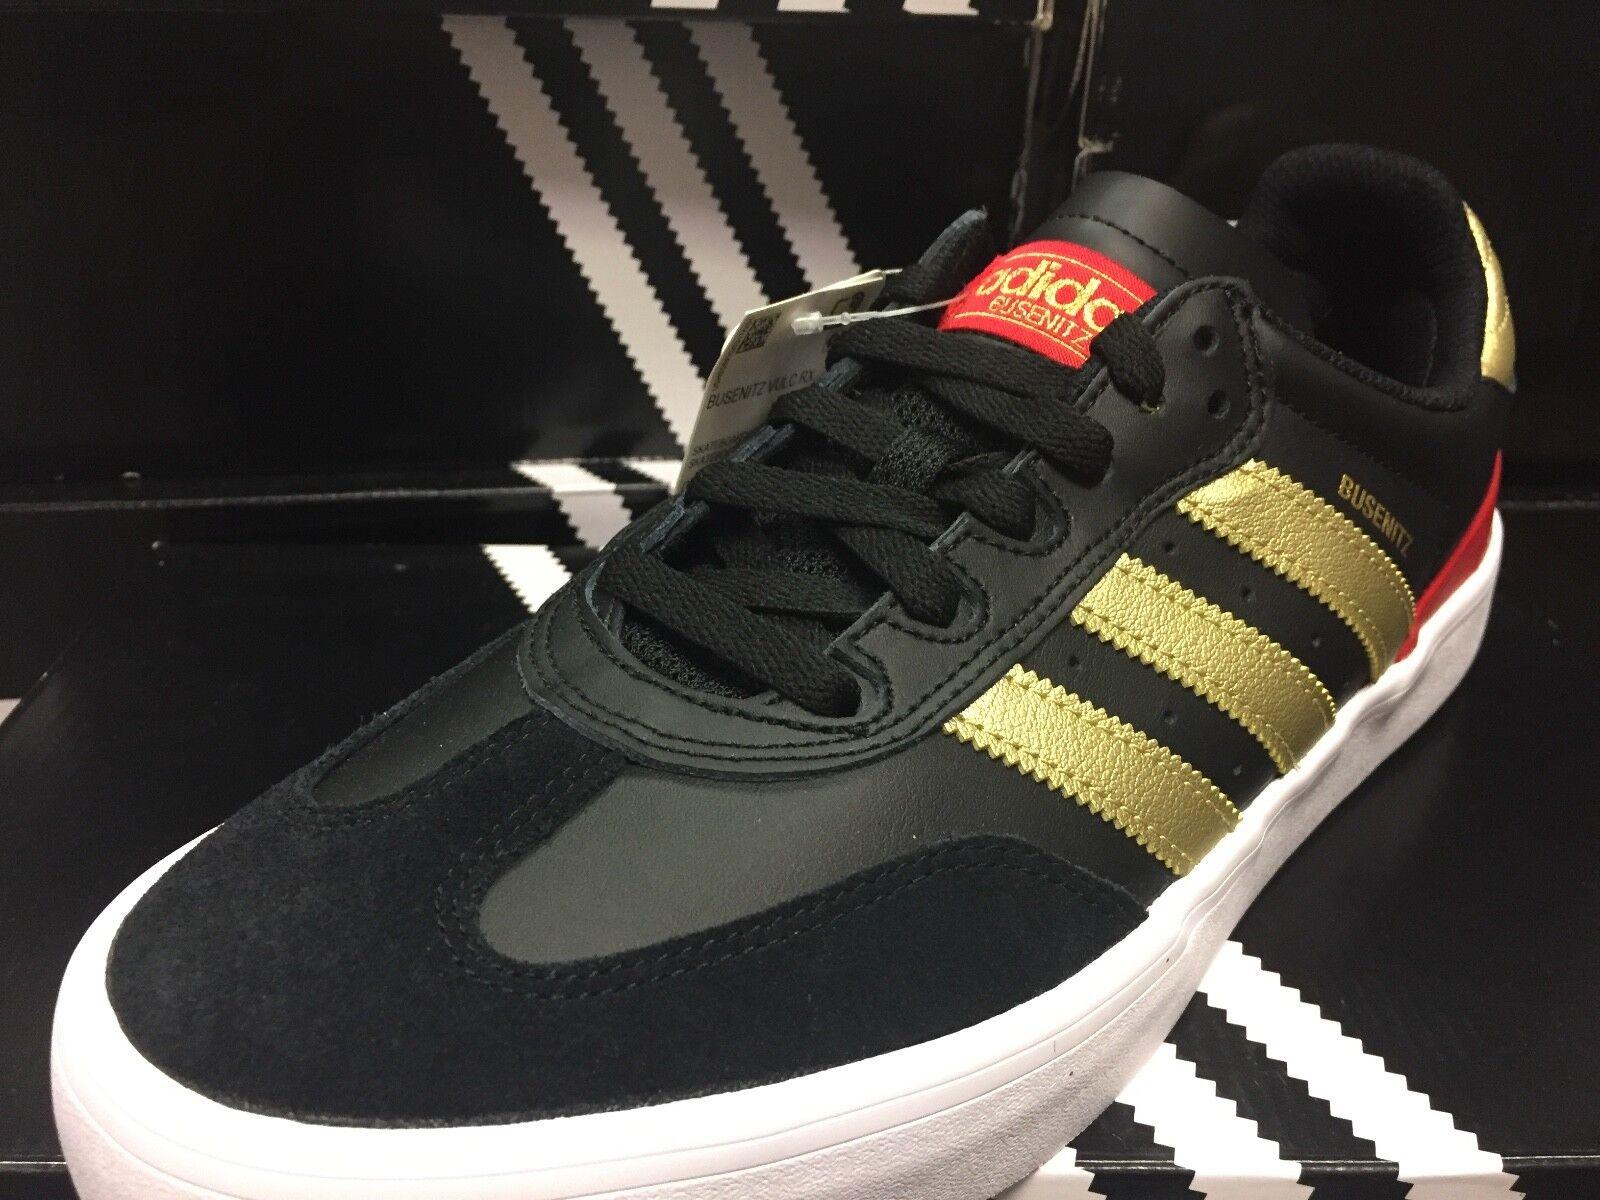 Adidas busenitz vul rx cq1170 12 Uomo skateboard scarpe taglia 12 cq1170 b65486